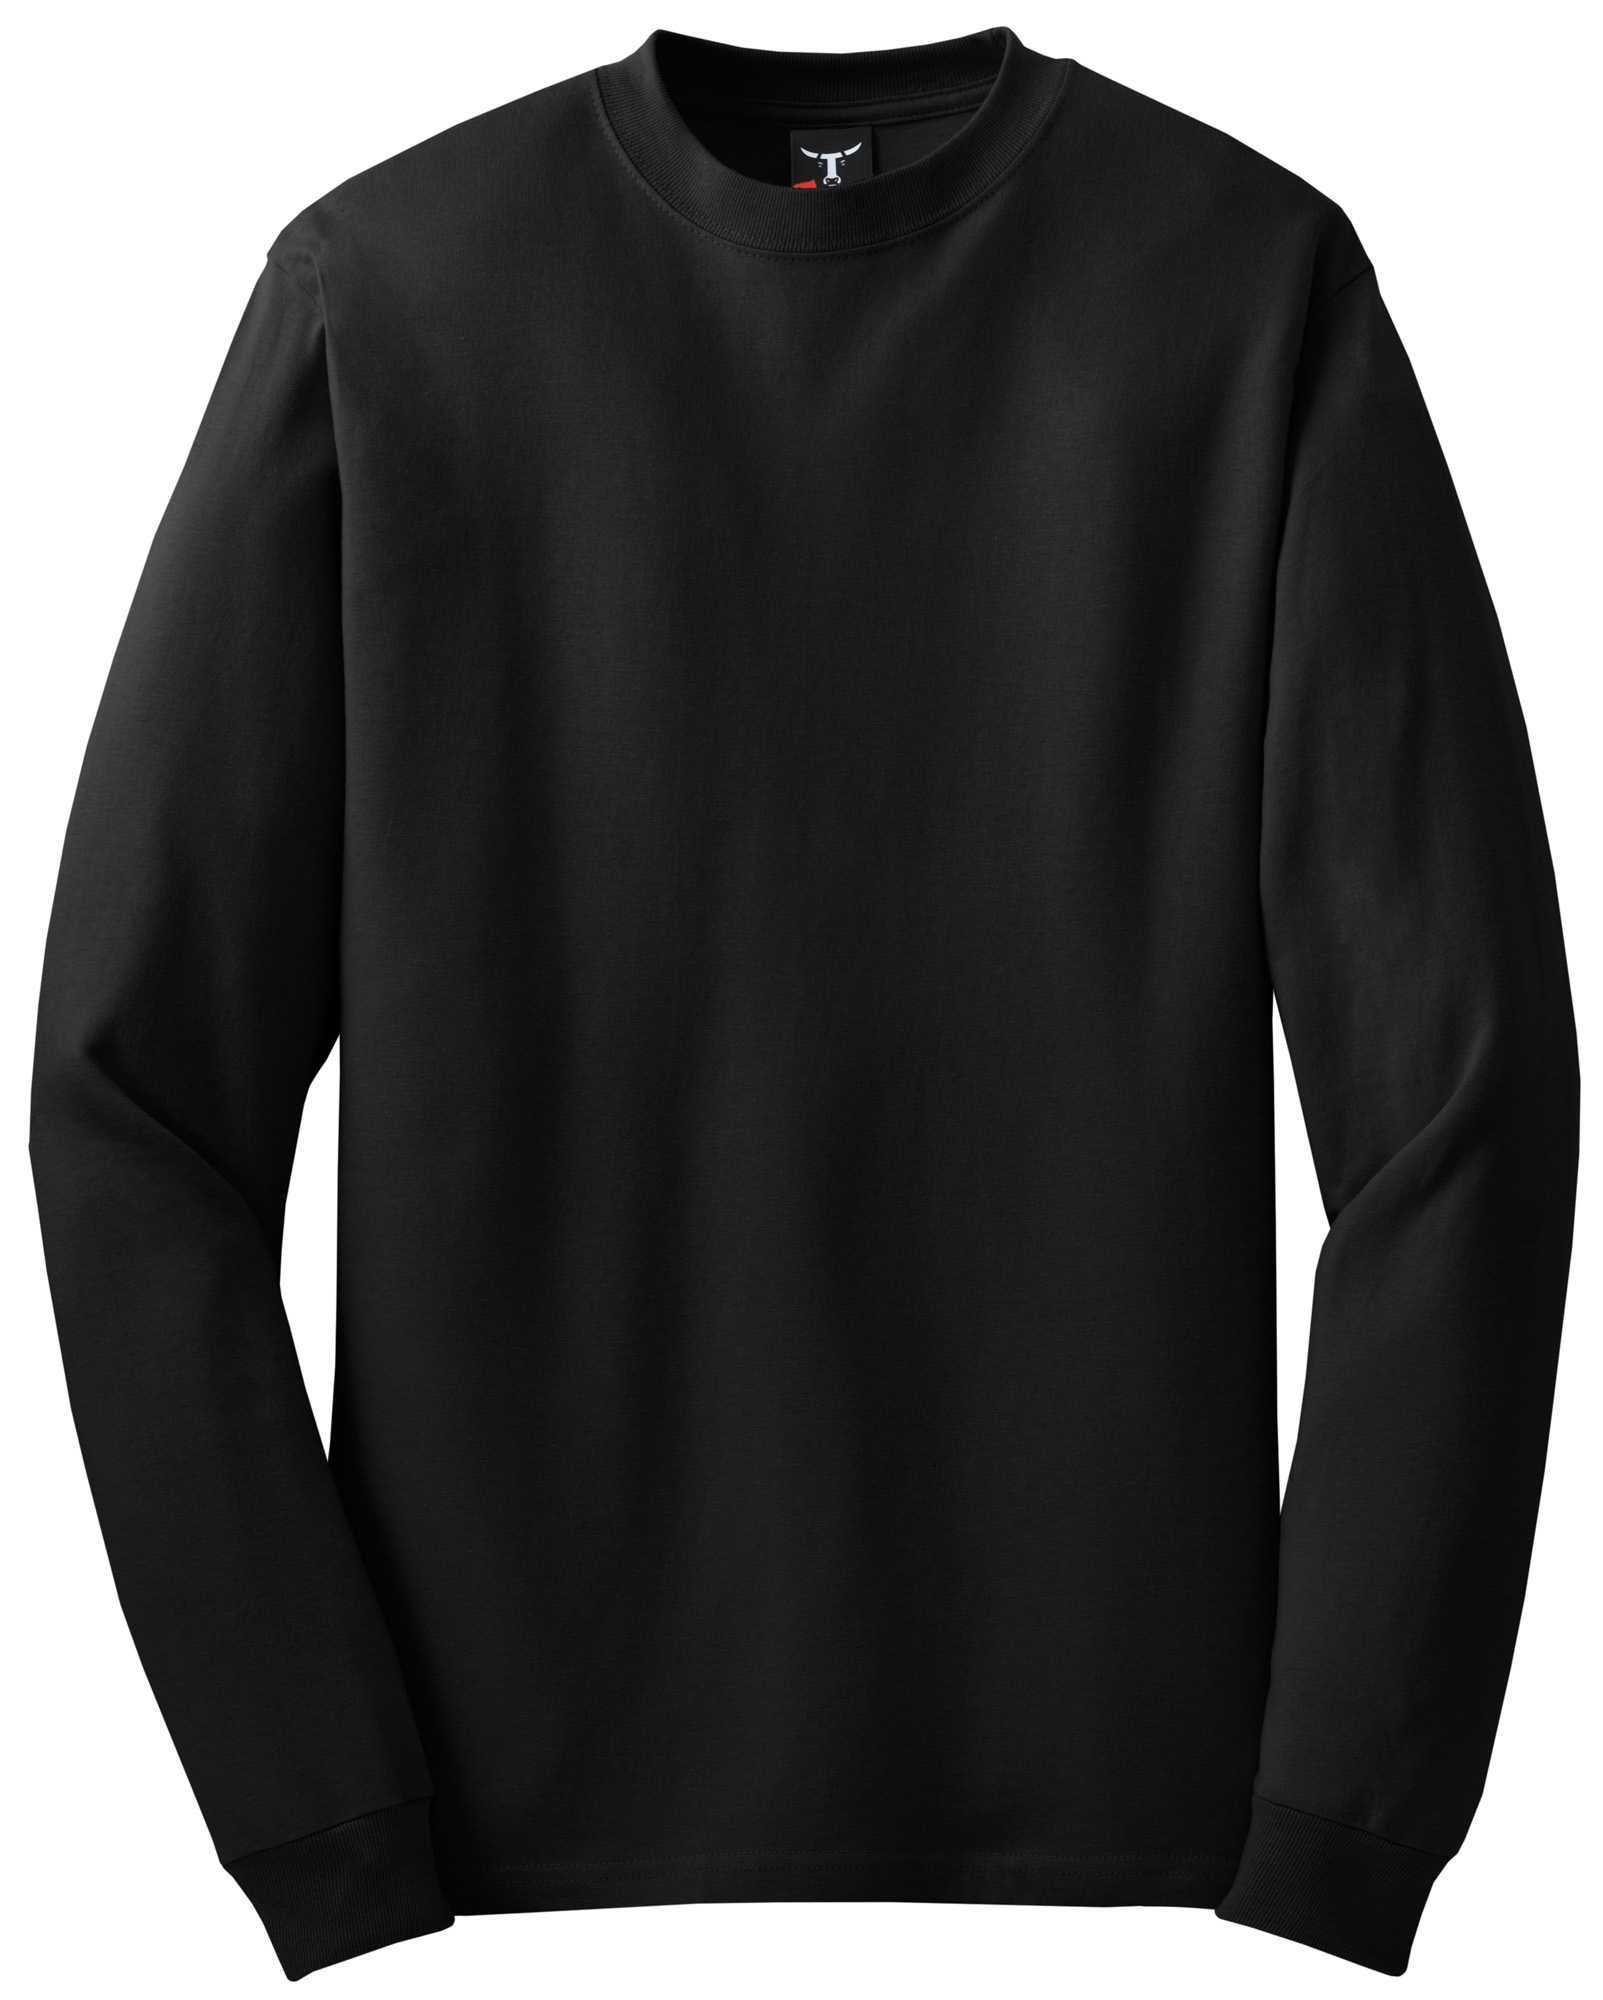 Black t shirt hanes - 5186_darkchocolate_flat_front_2009 5186_deepforest_flat_front_2009 5186_deepnavy_flat_front_2009 5186_deepred_flat_front_2009